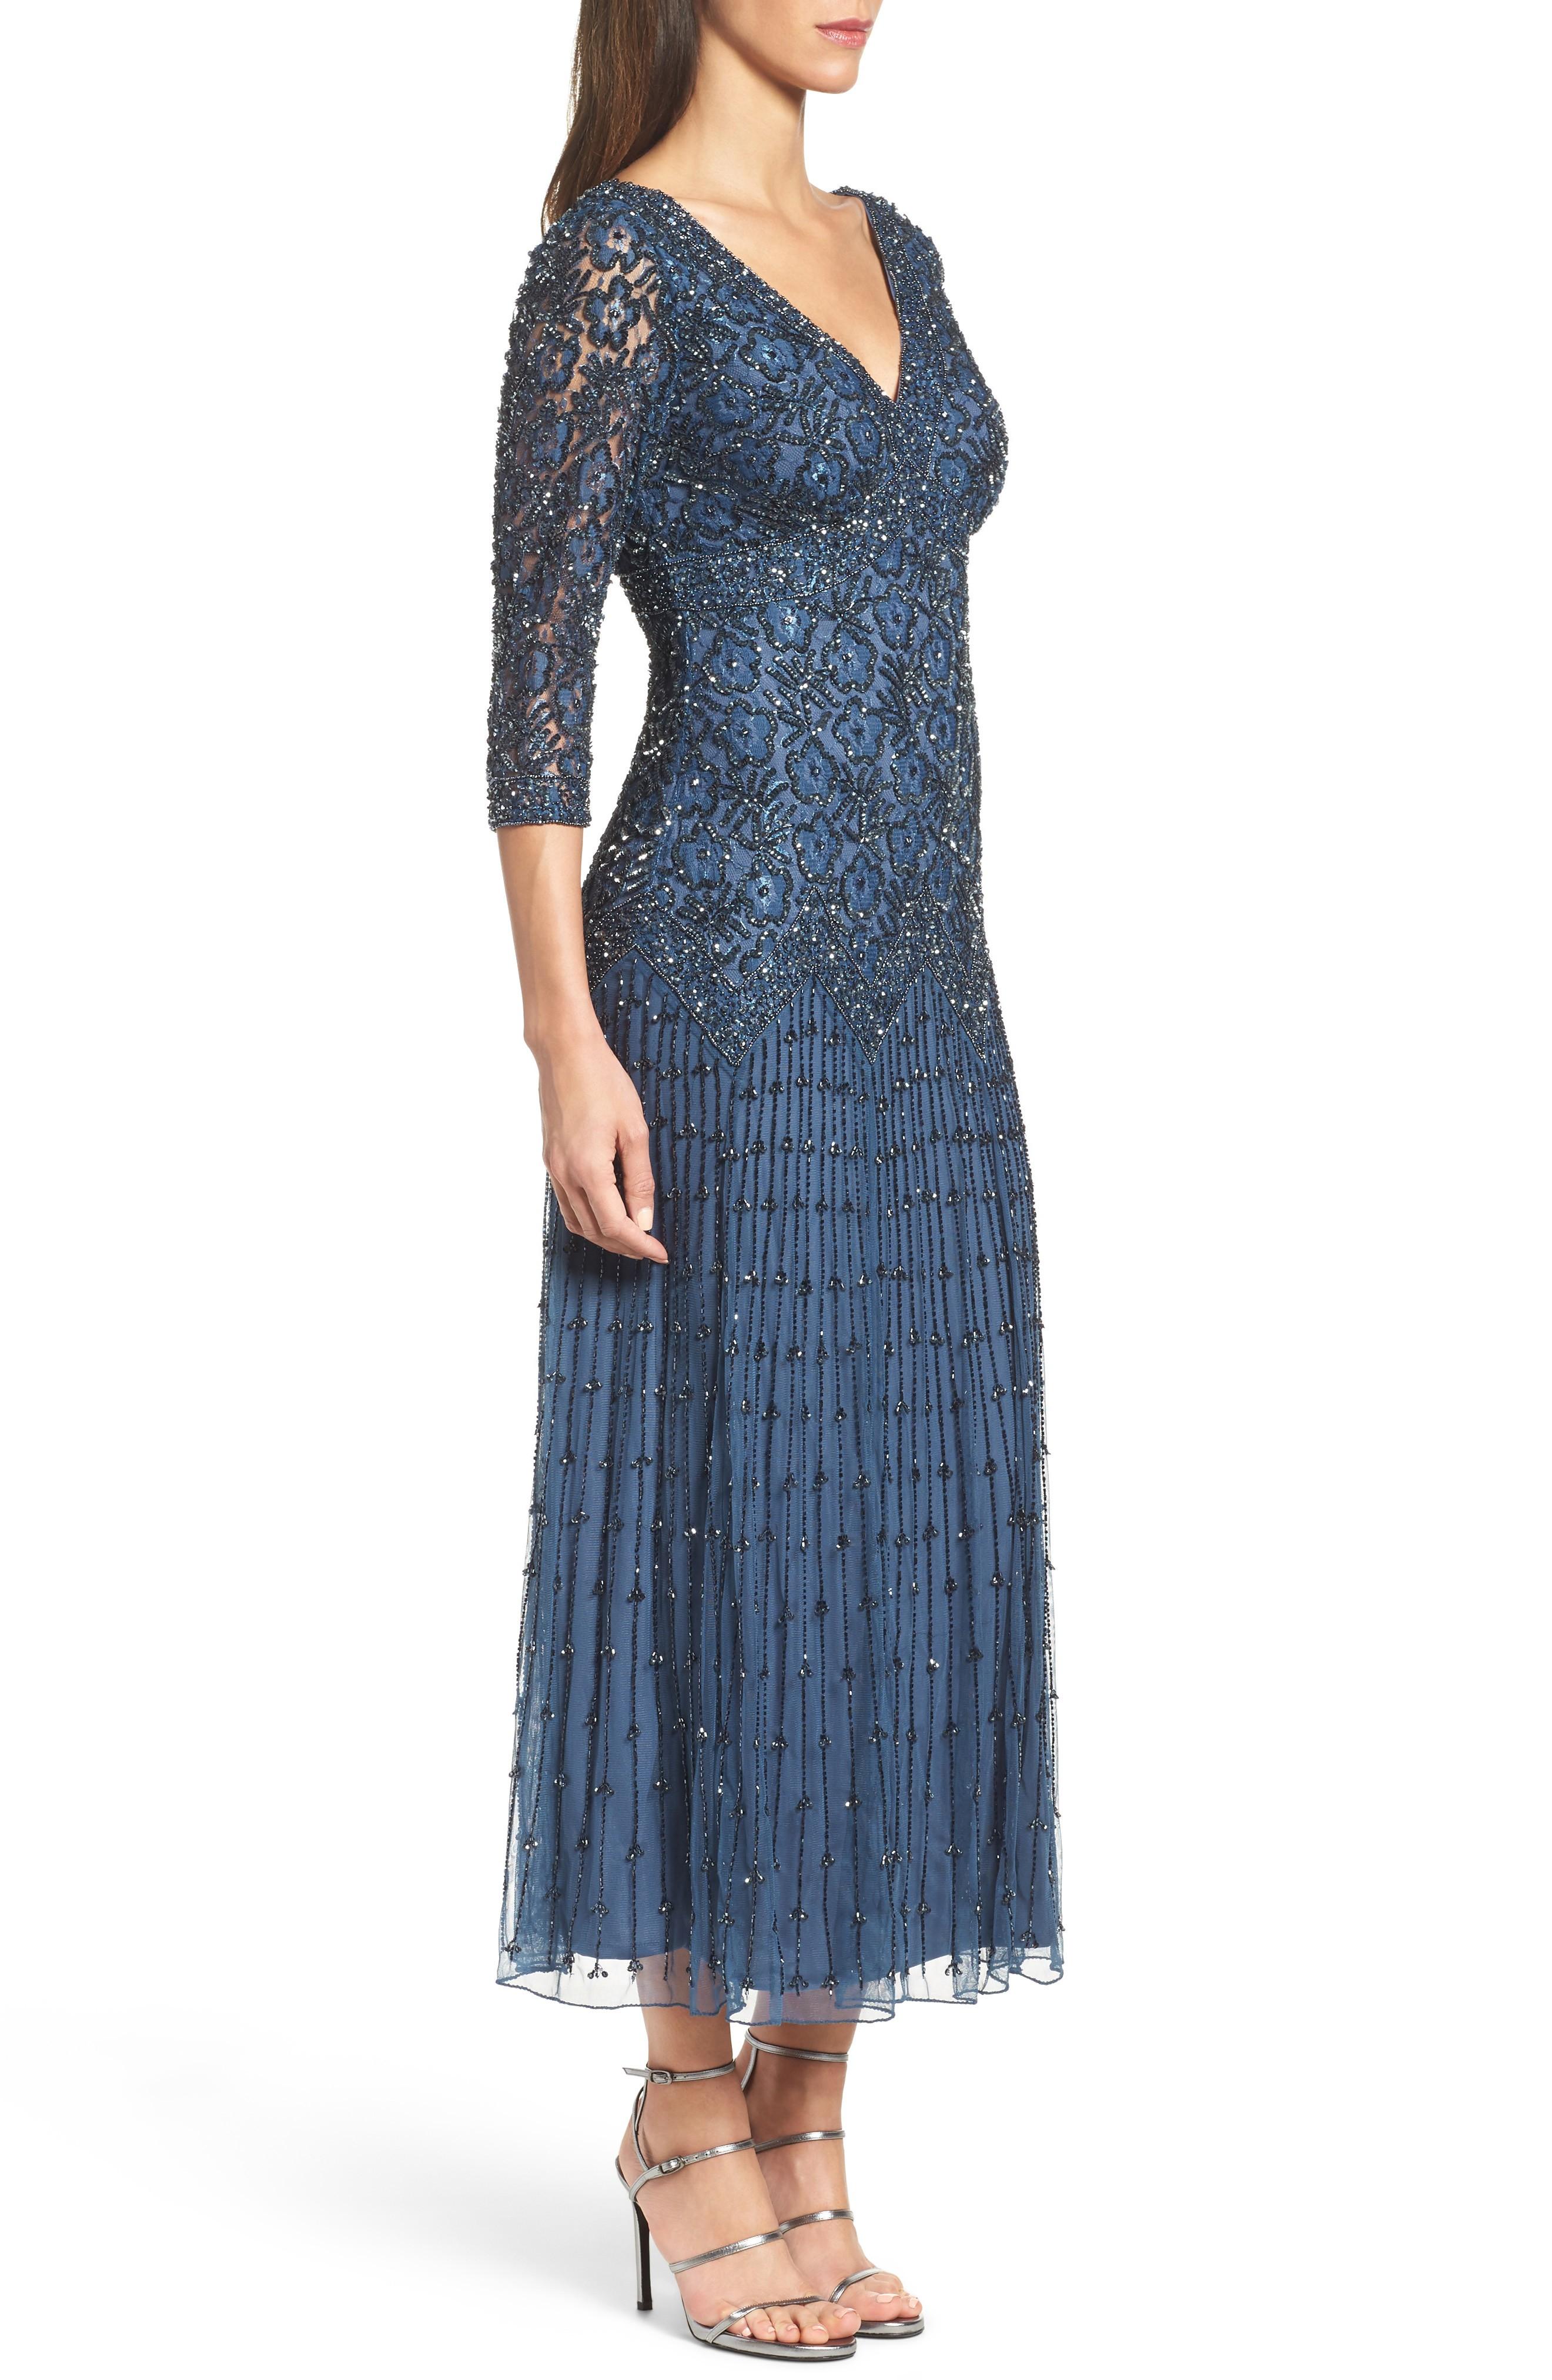 PISARRO NIGHTS Beaded Mesh Blue Dress - We Select Dresses